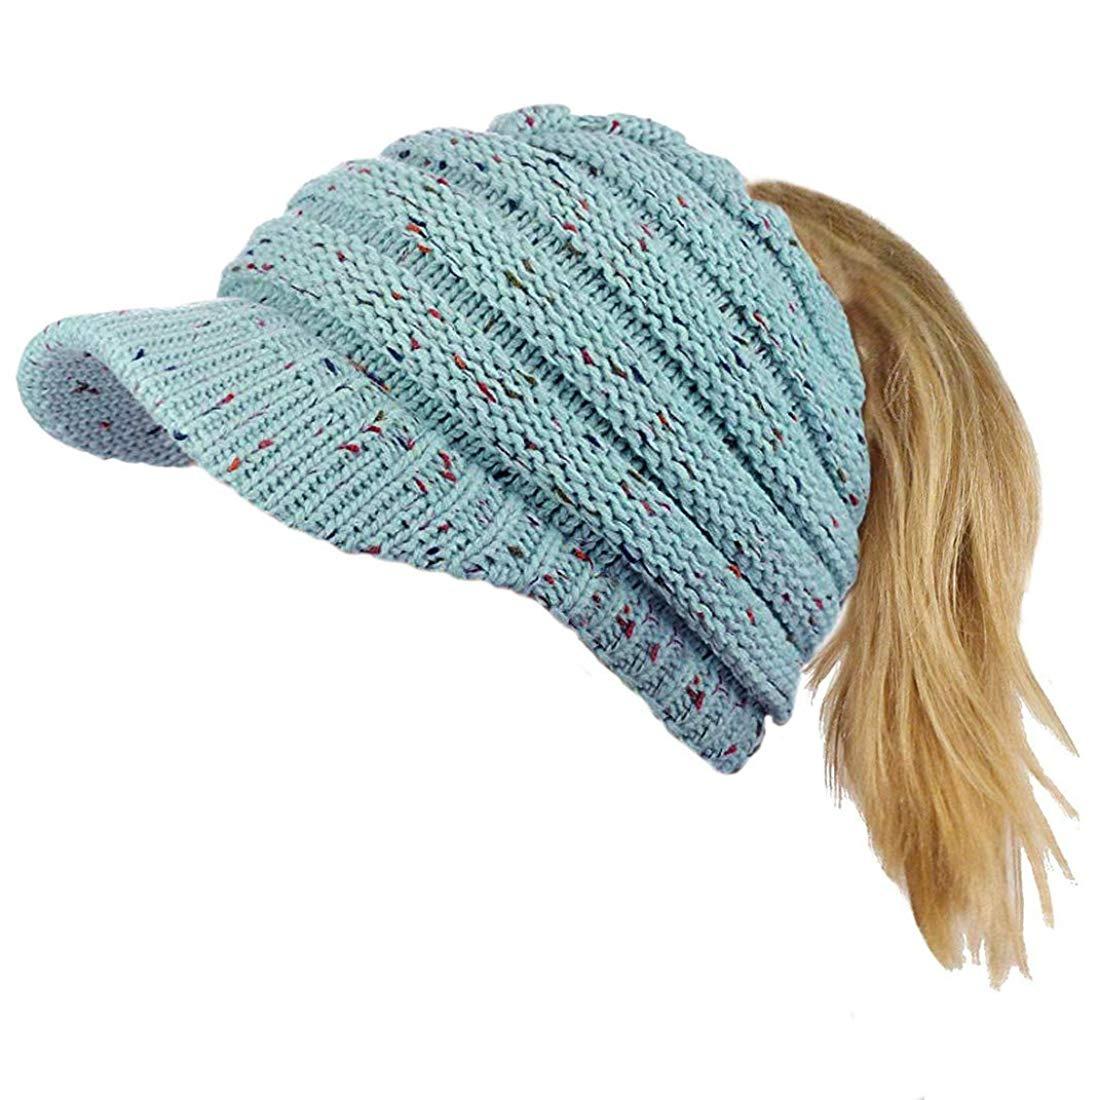 Gorro De Lana Con Visera Confeti Azul Claro Para Mujer -   67.900 en ... 651ca847389